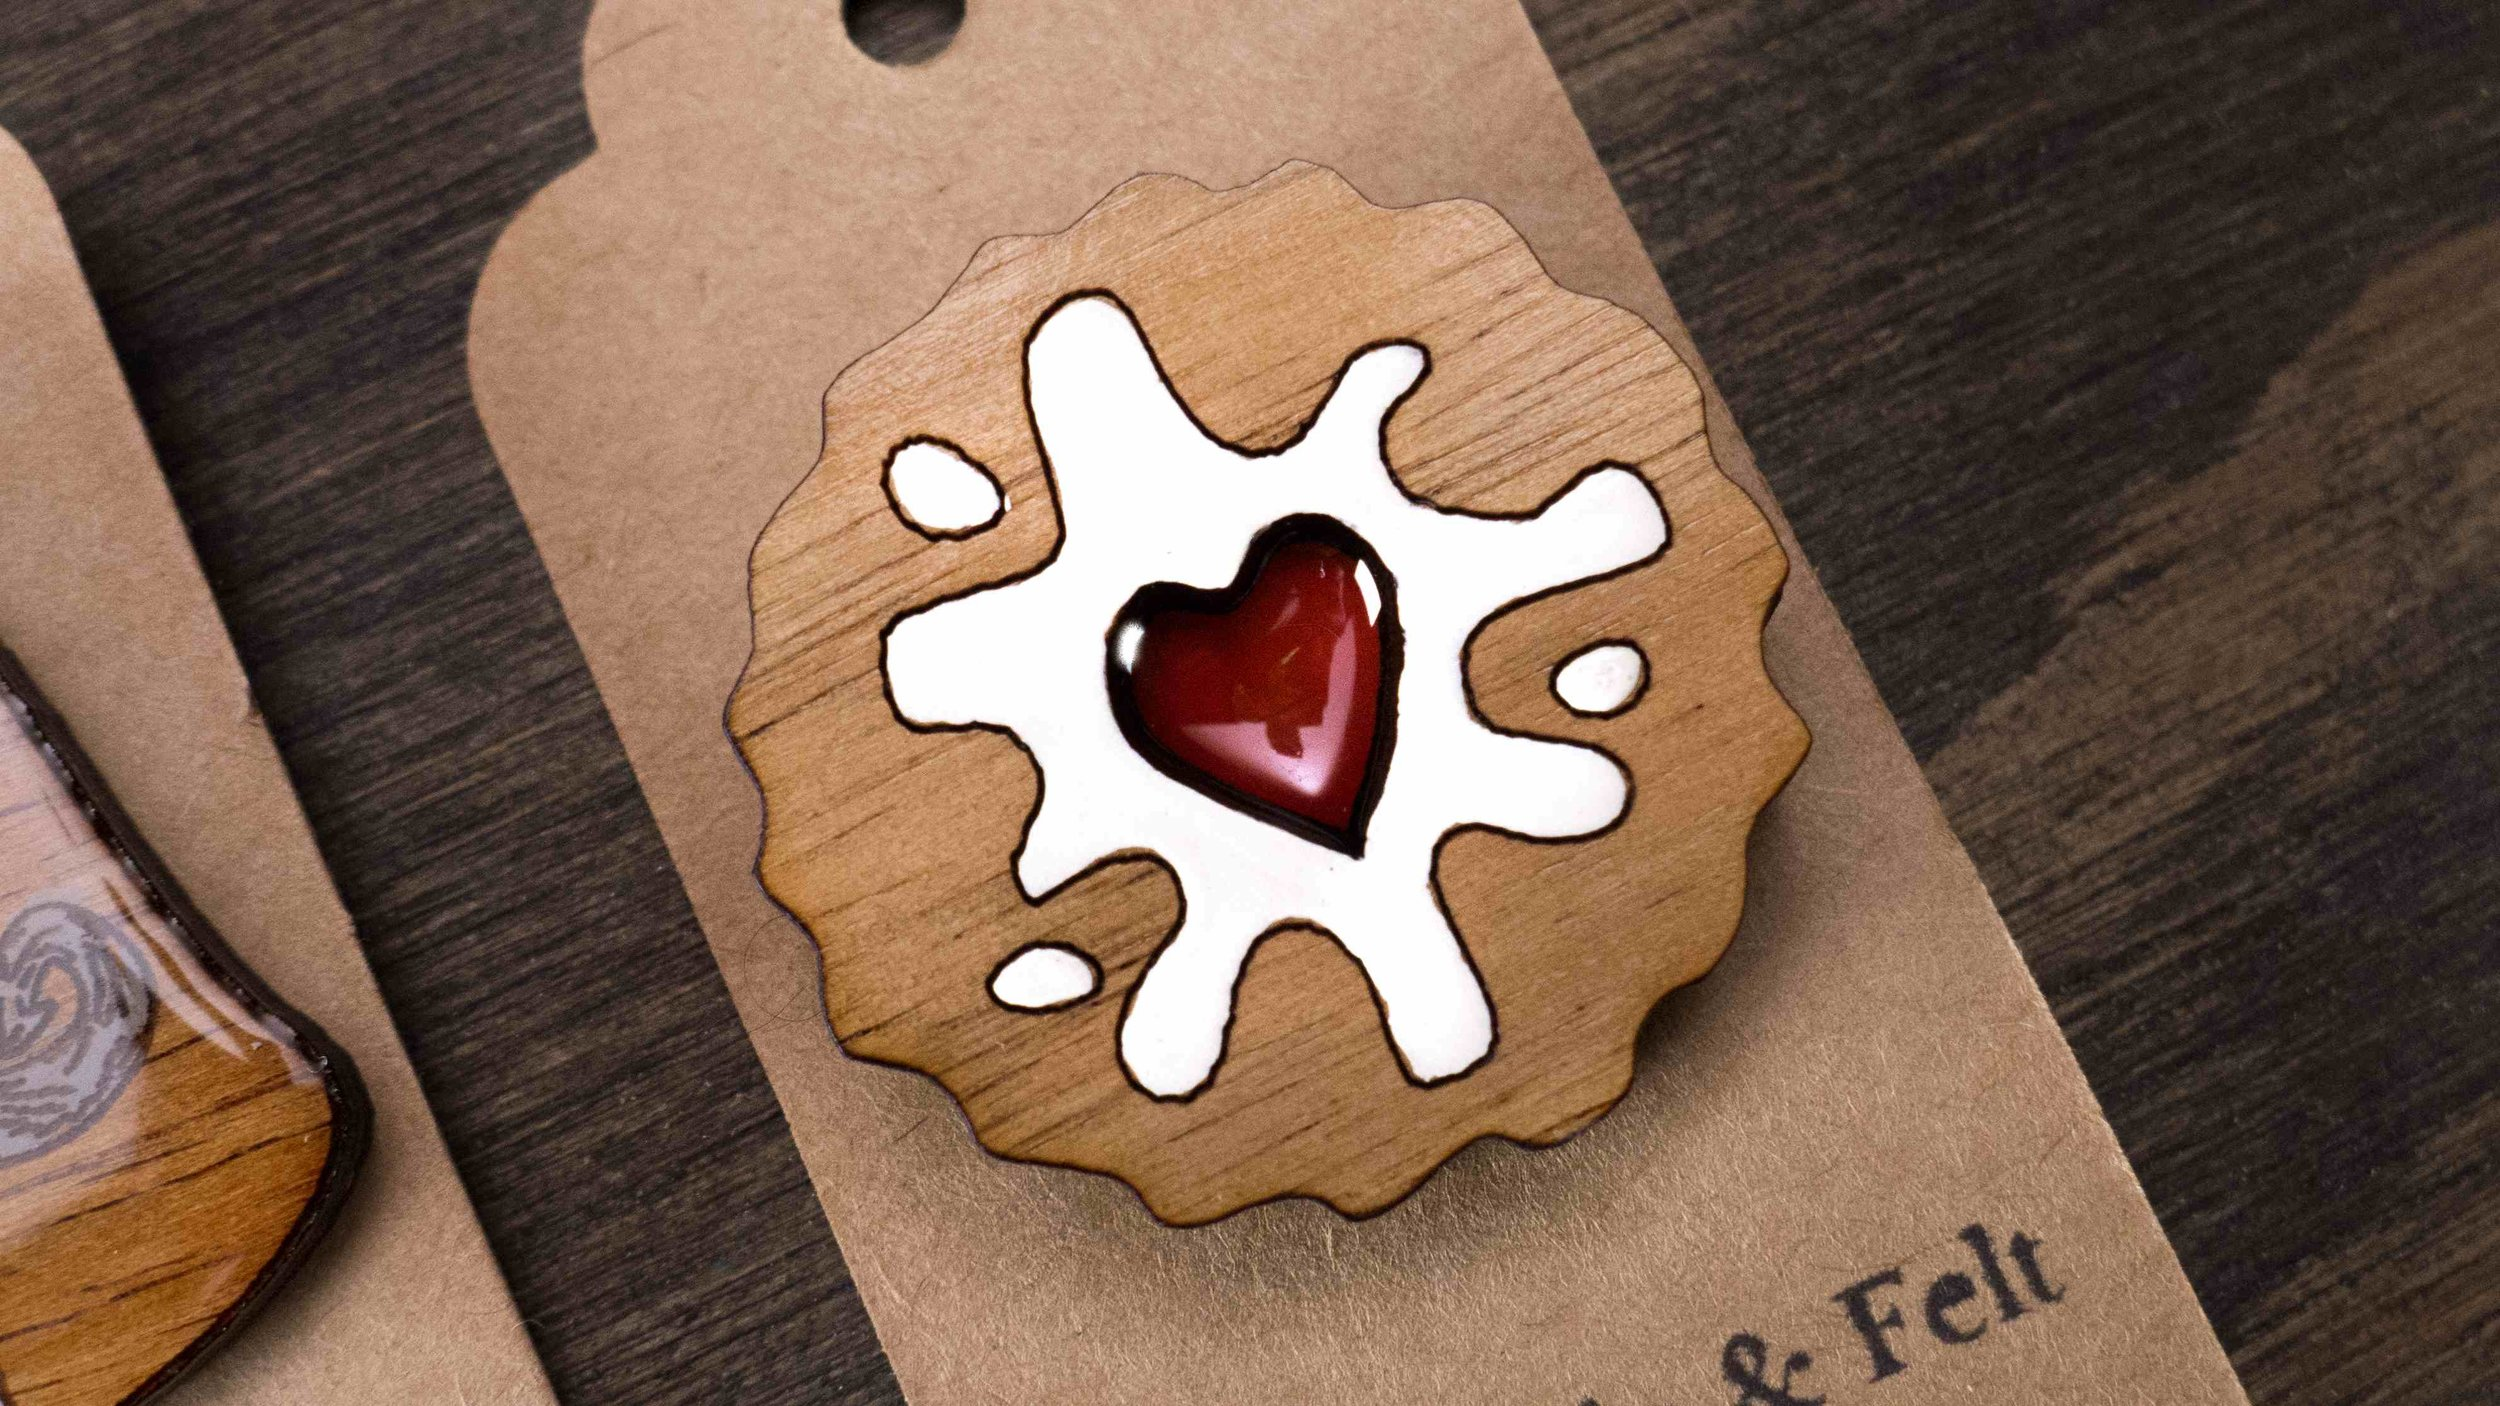 T&F heart.jpg